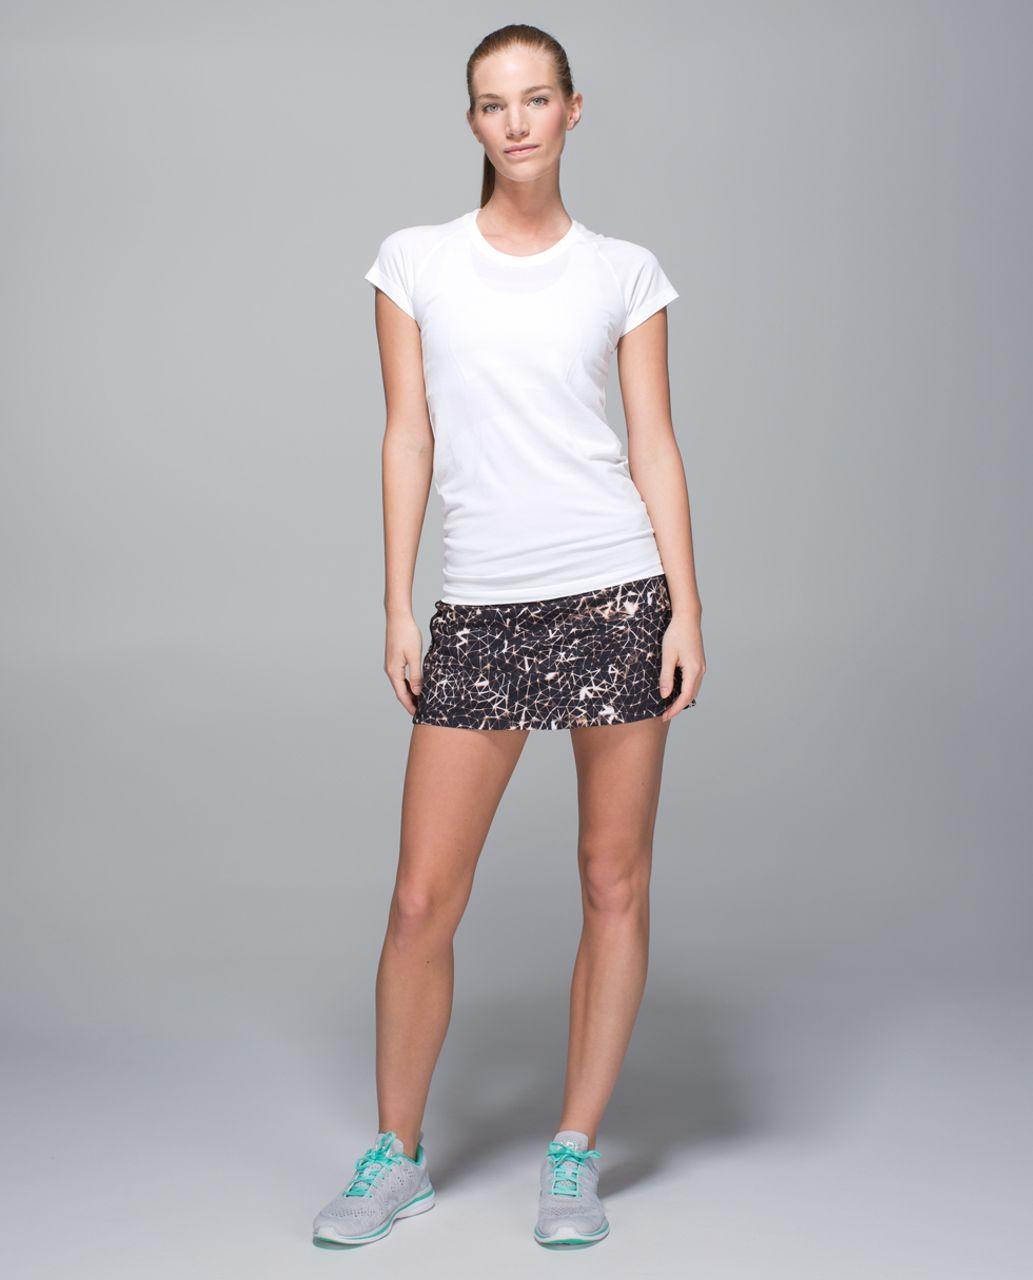 Lululemon Pace Rival Skirt II *4-way Stretch (Tall) - Sugar Crush Multi / Black